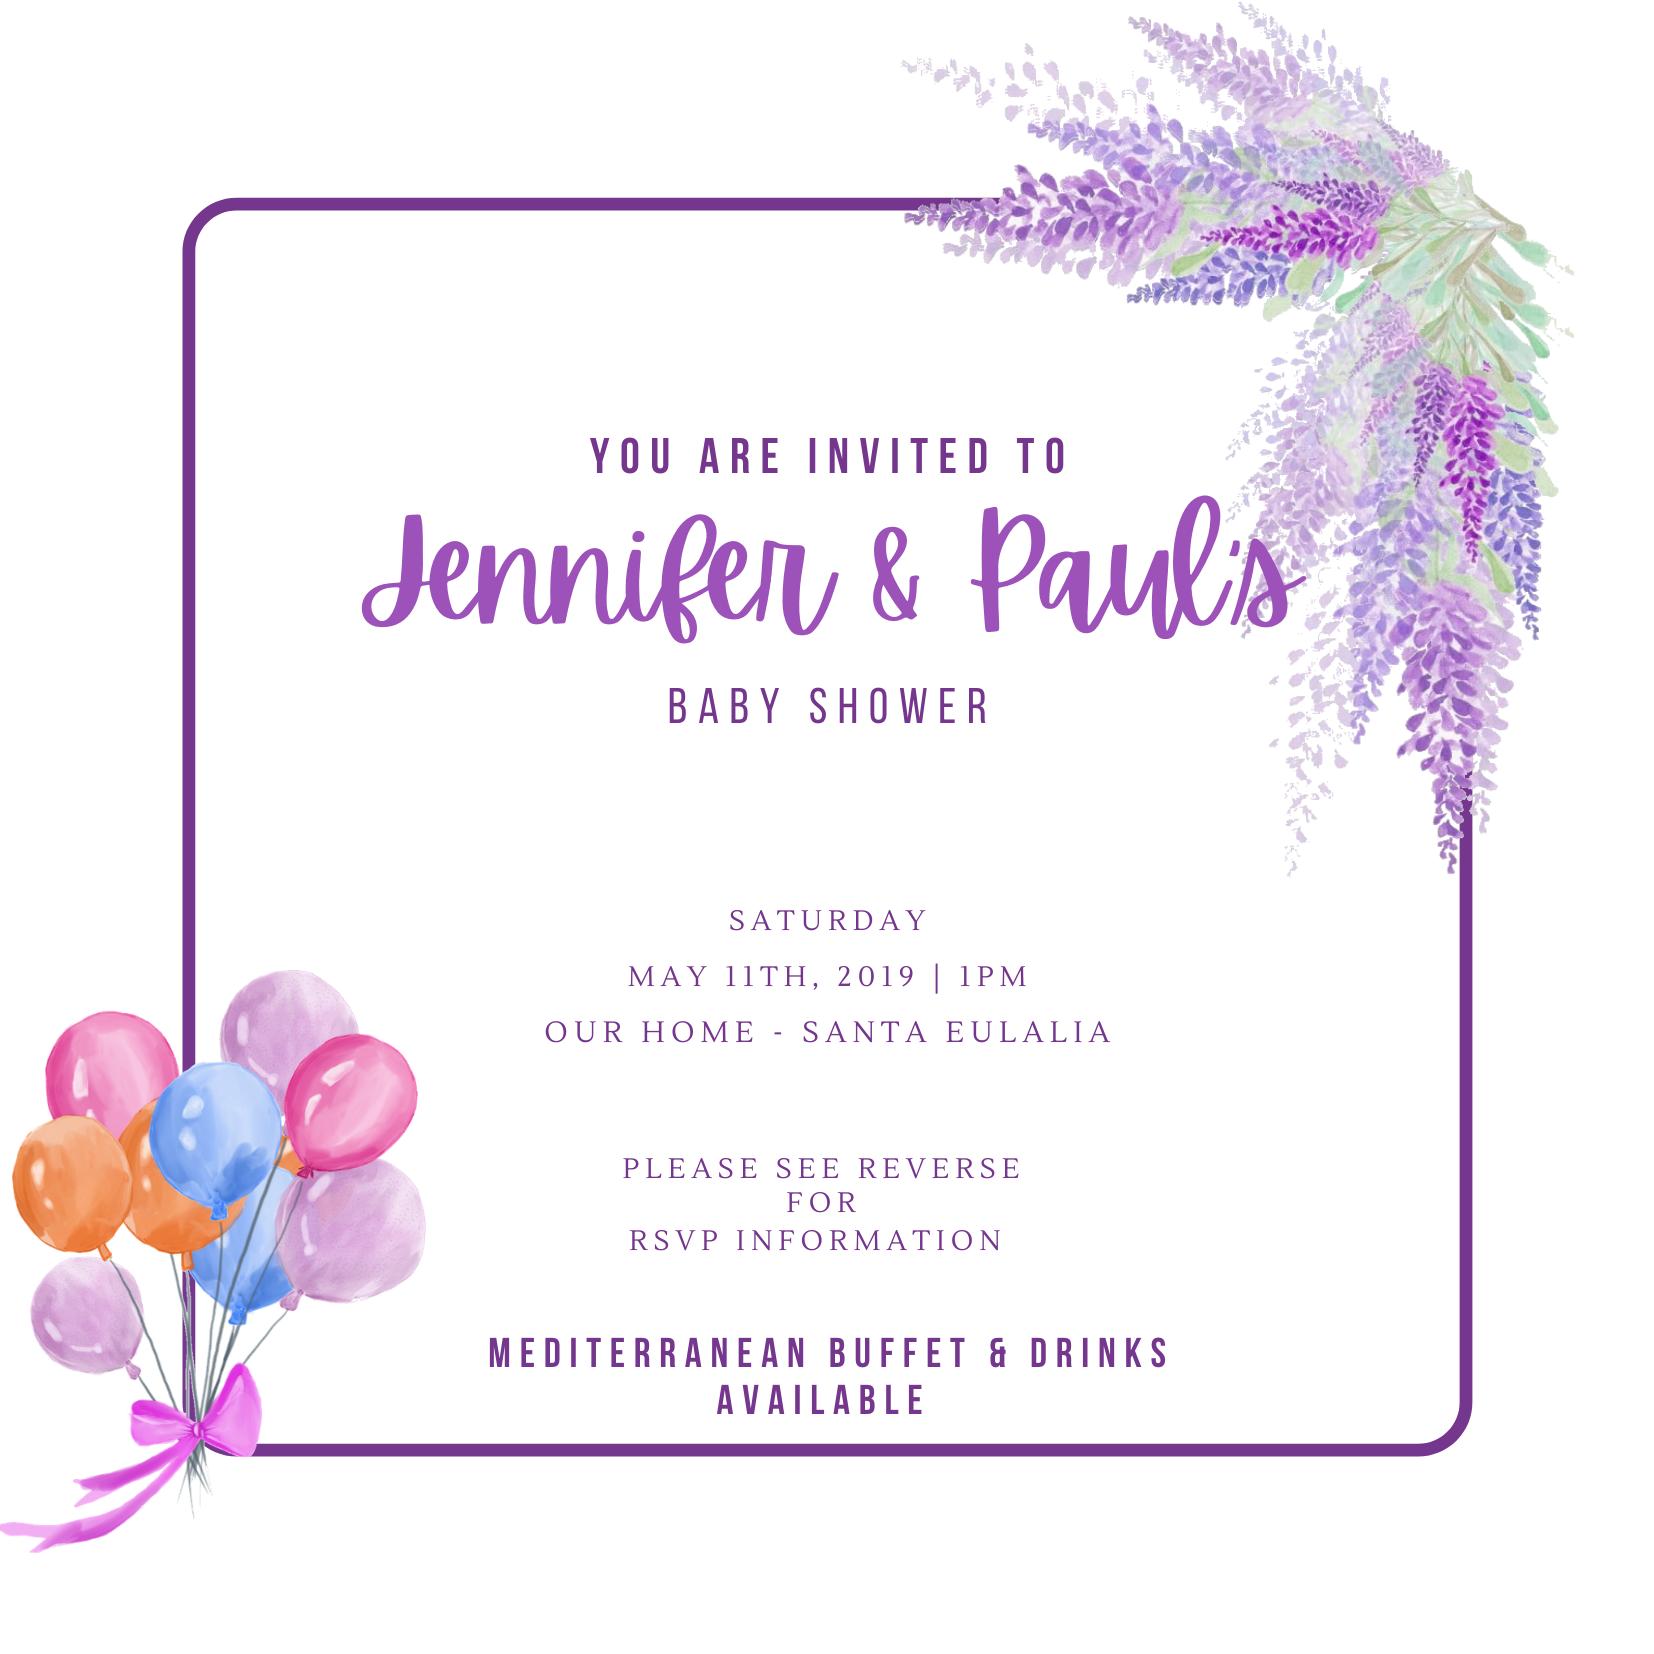 Invitation Design - Alexandra Rose Creative